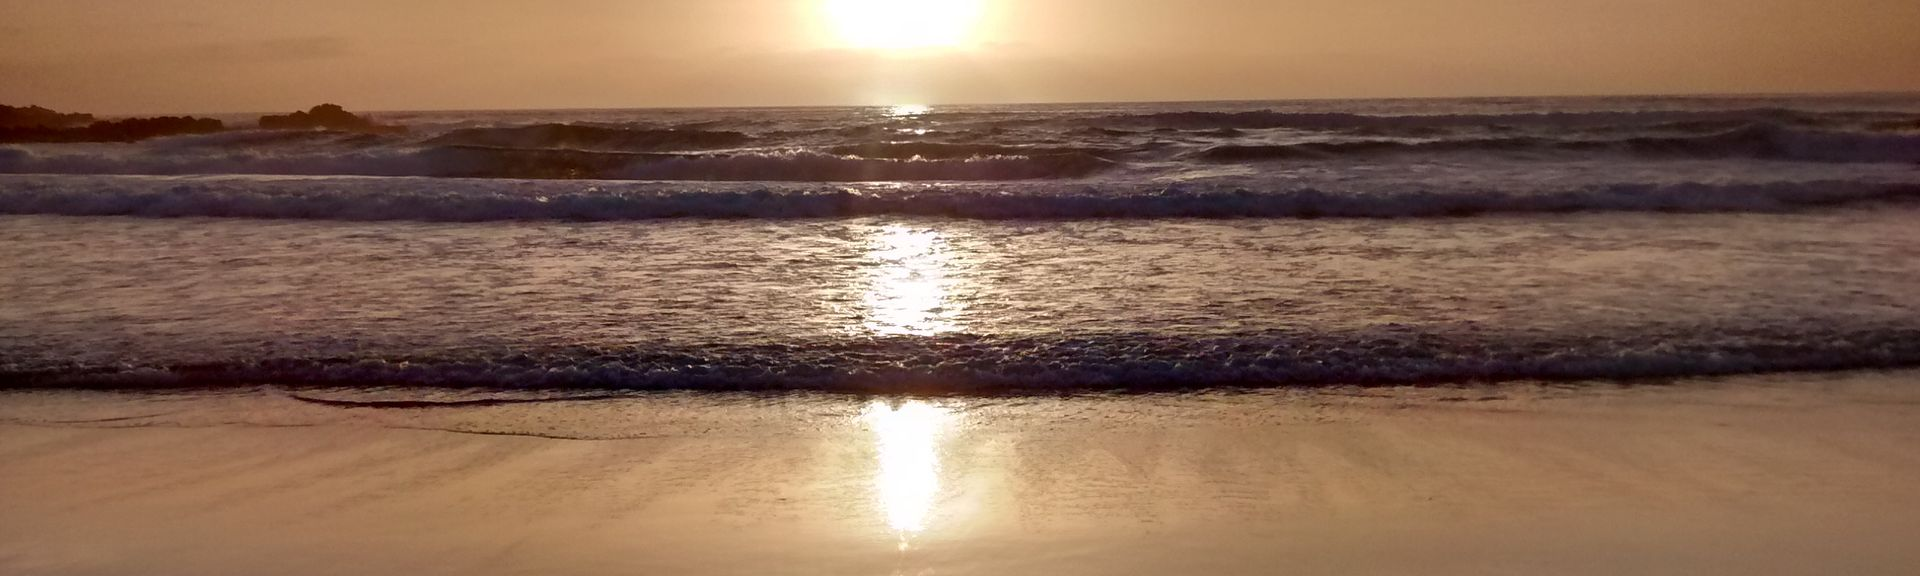 Playas de Rosarito, Baja California, Mexico